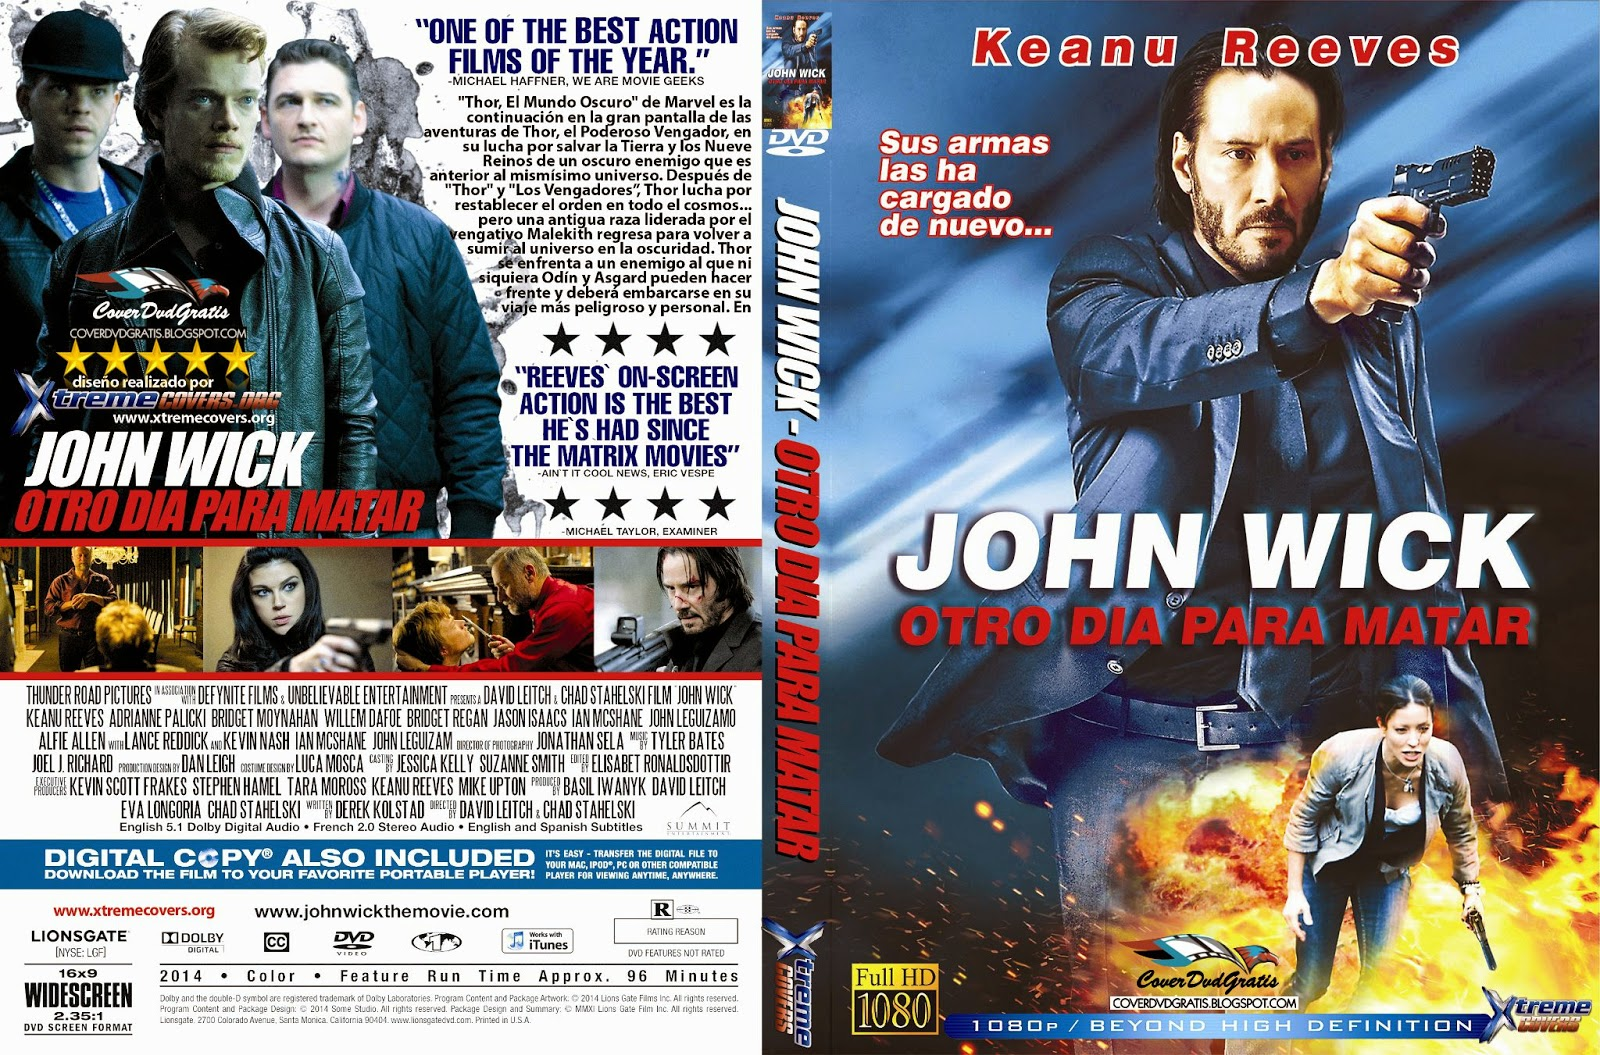 John Wick Caratula Dvd Archivos Coverdvdgratis